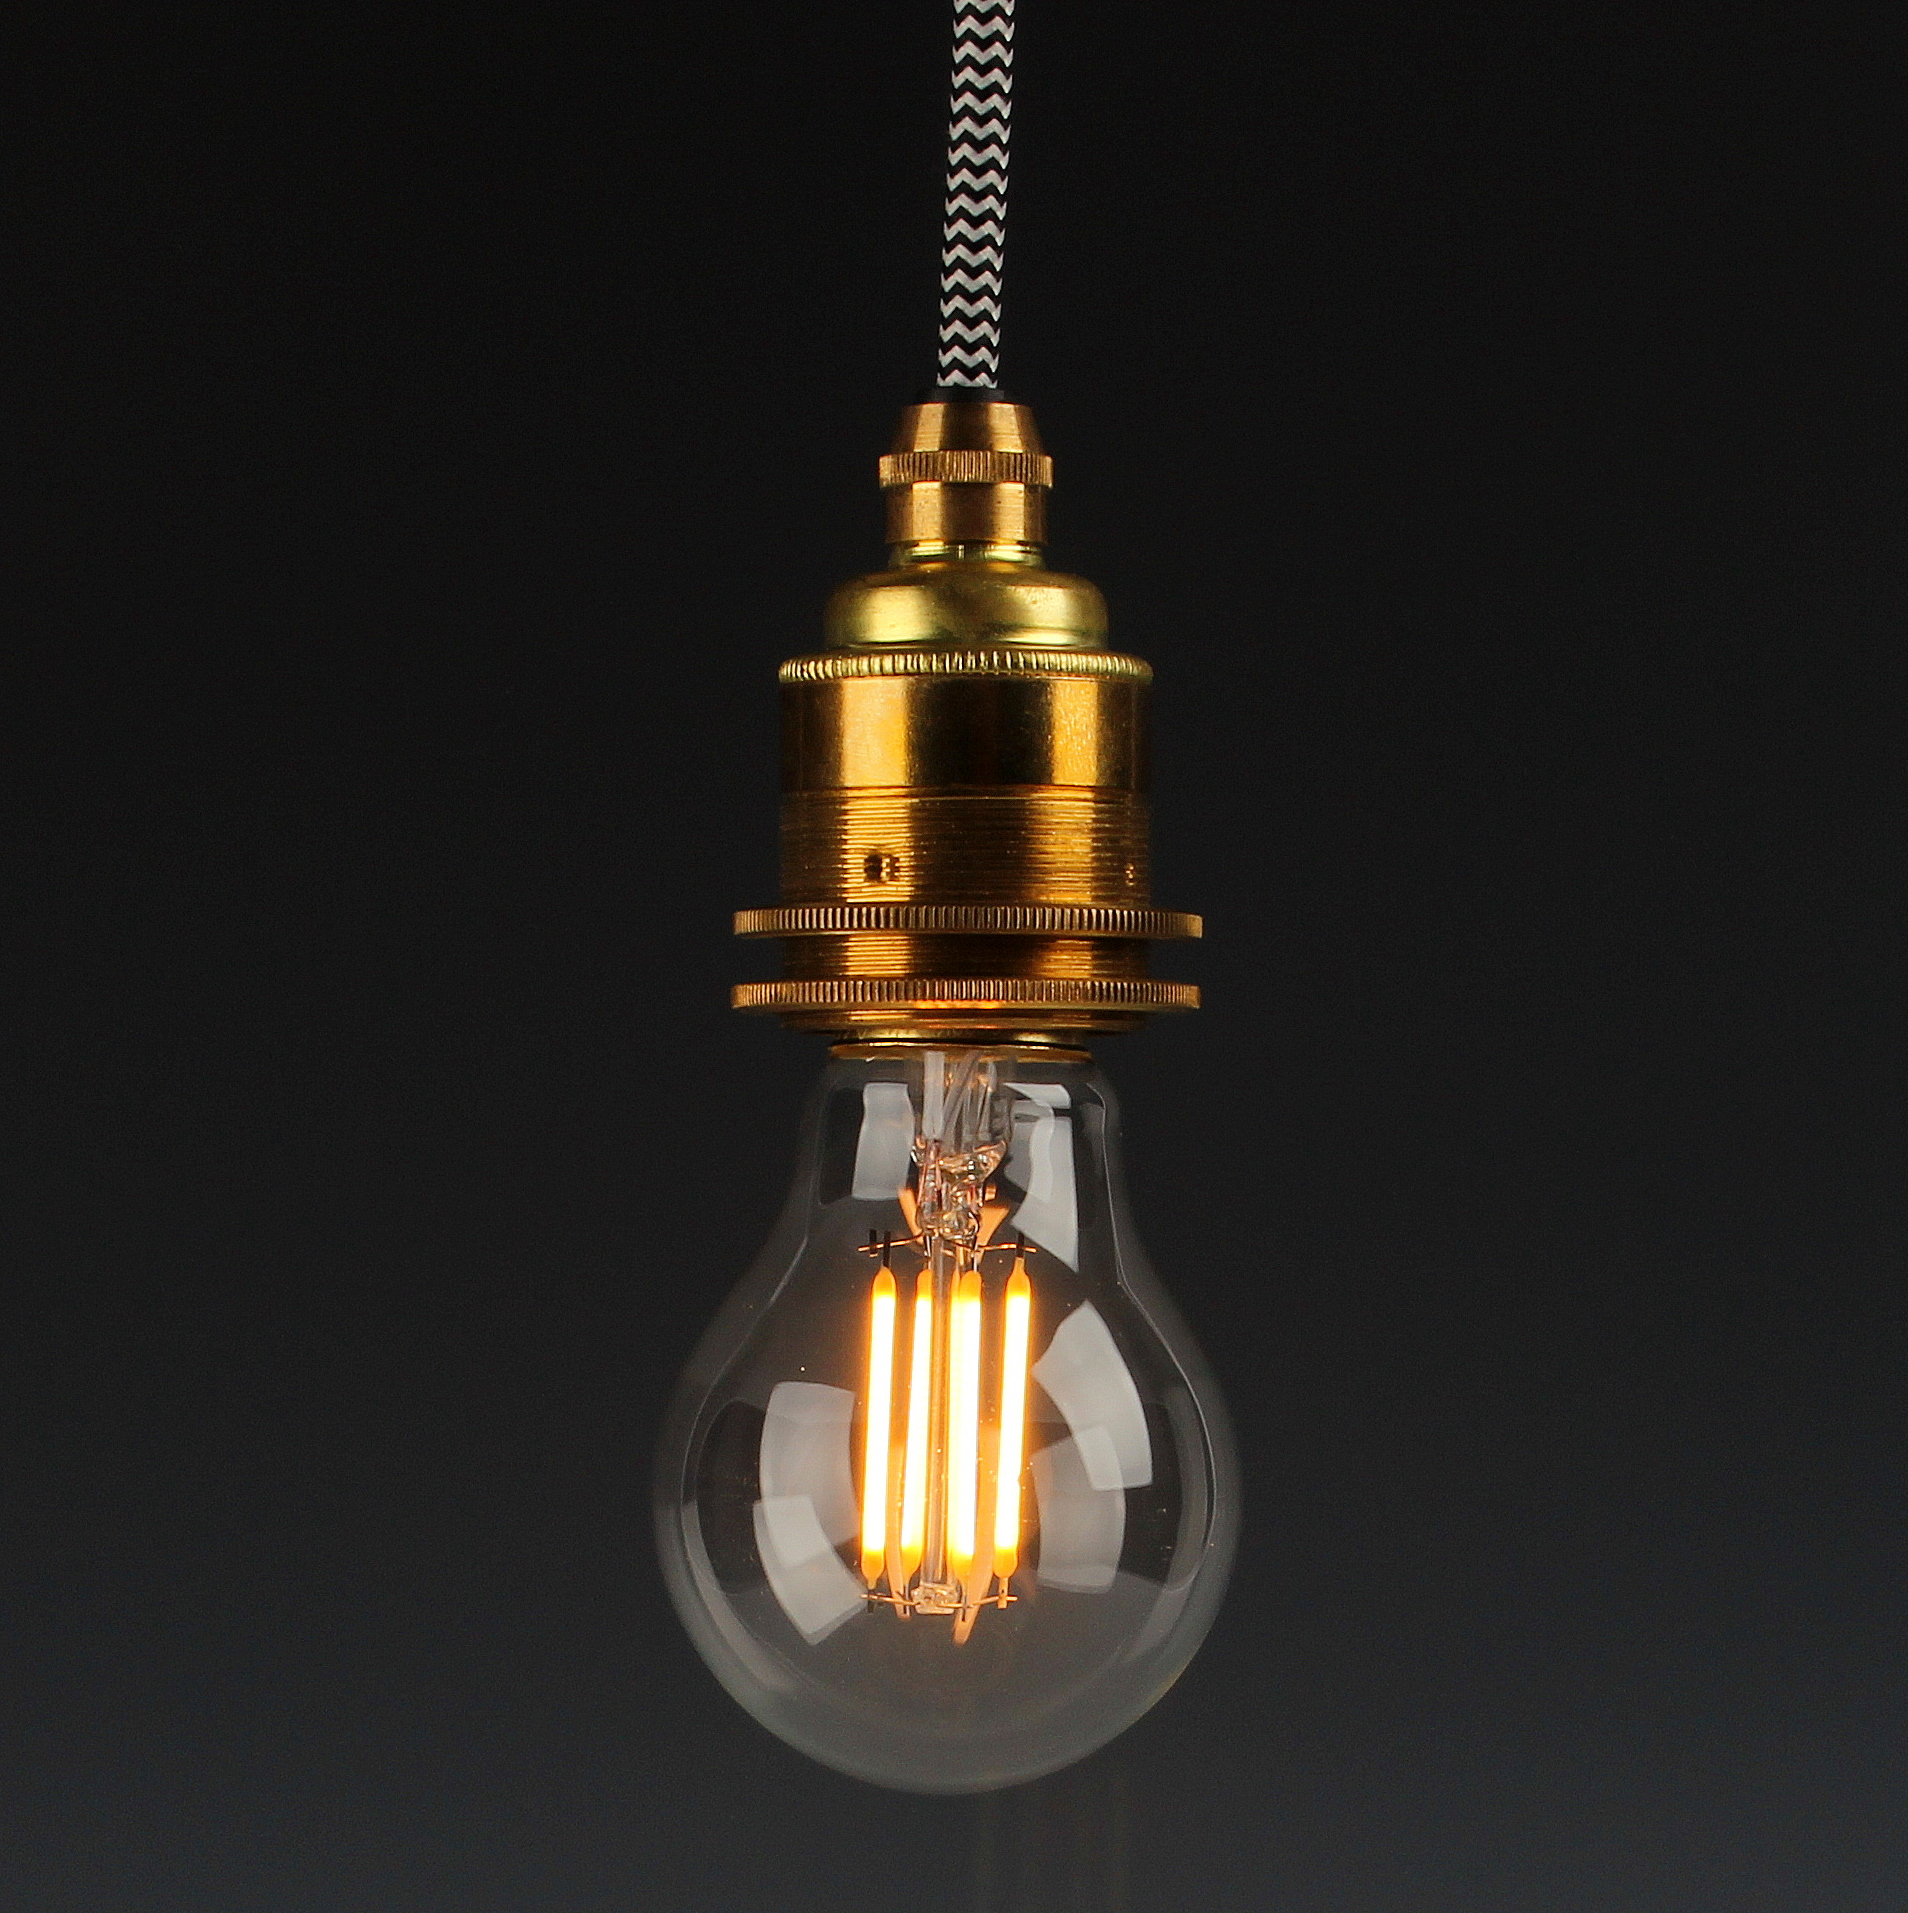 danlamp exteriorlampe e27 deko led leuchtmittel 1 radio k lsch hamburg. Black Bedroom Furniture Sets. Home Design Ideas